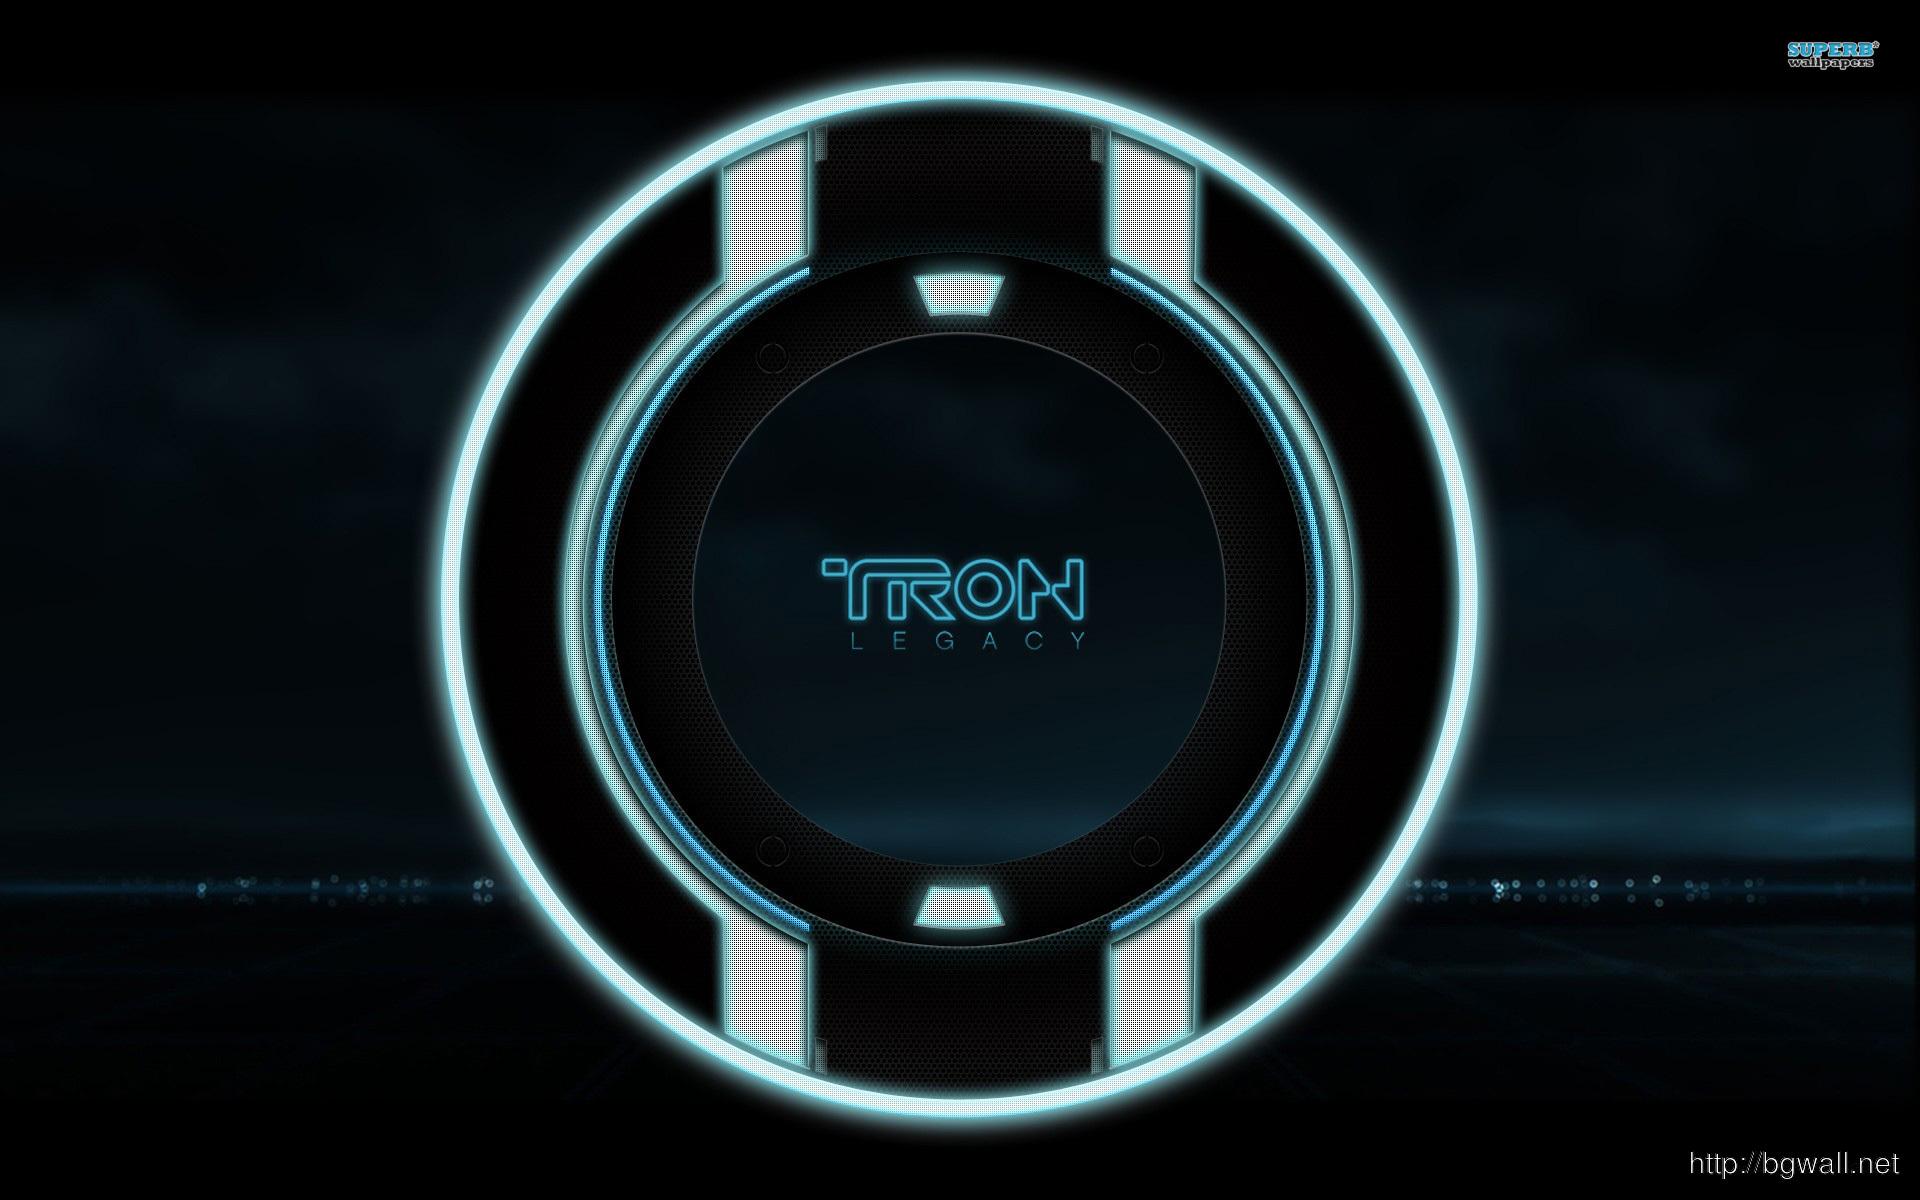 Tron Legacy Wallpaper Full Size